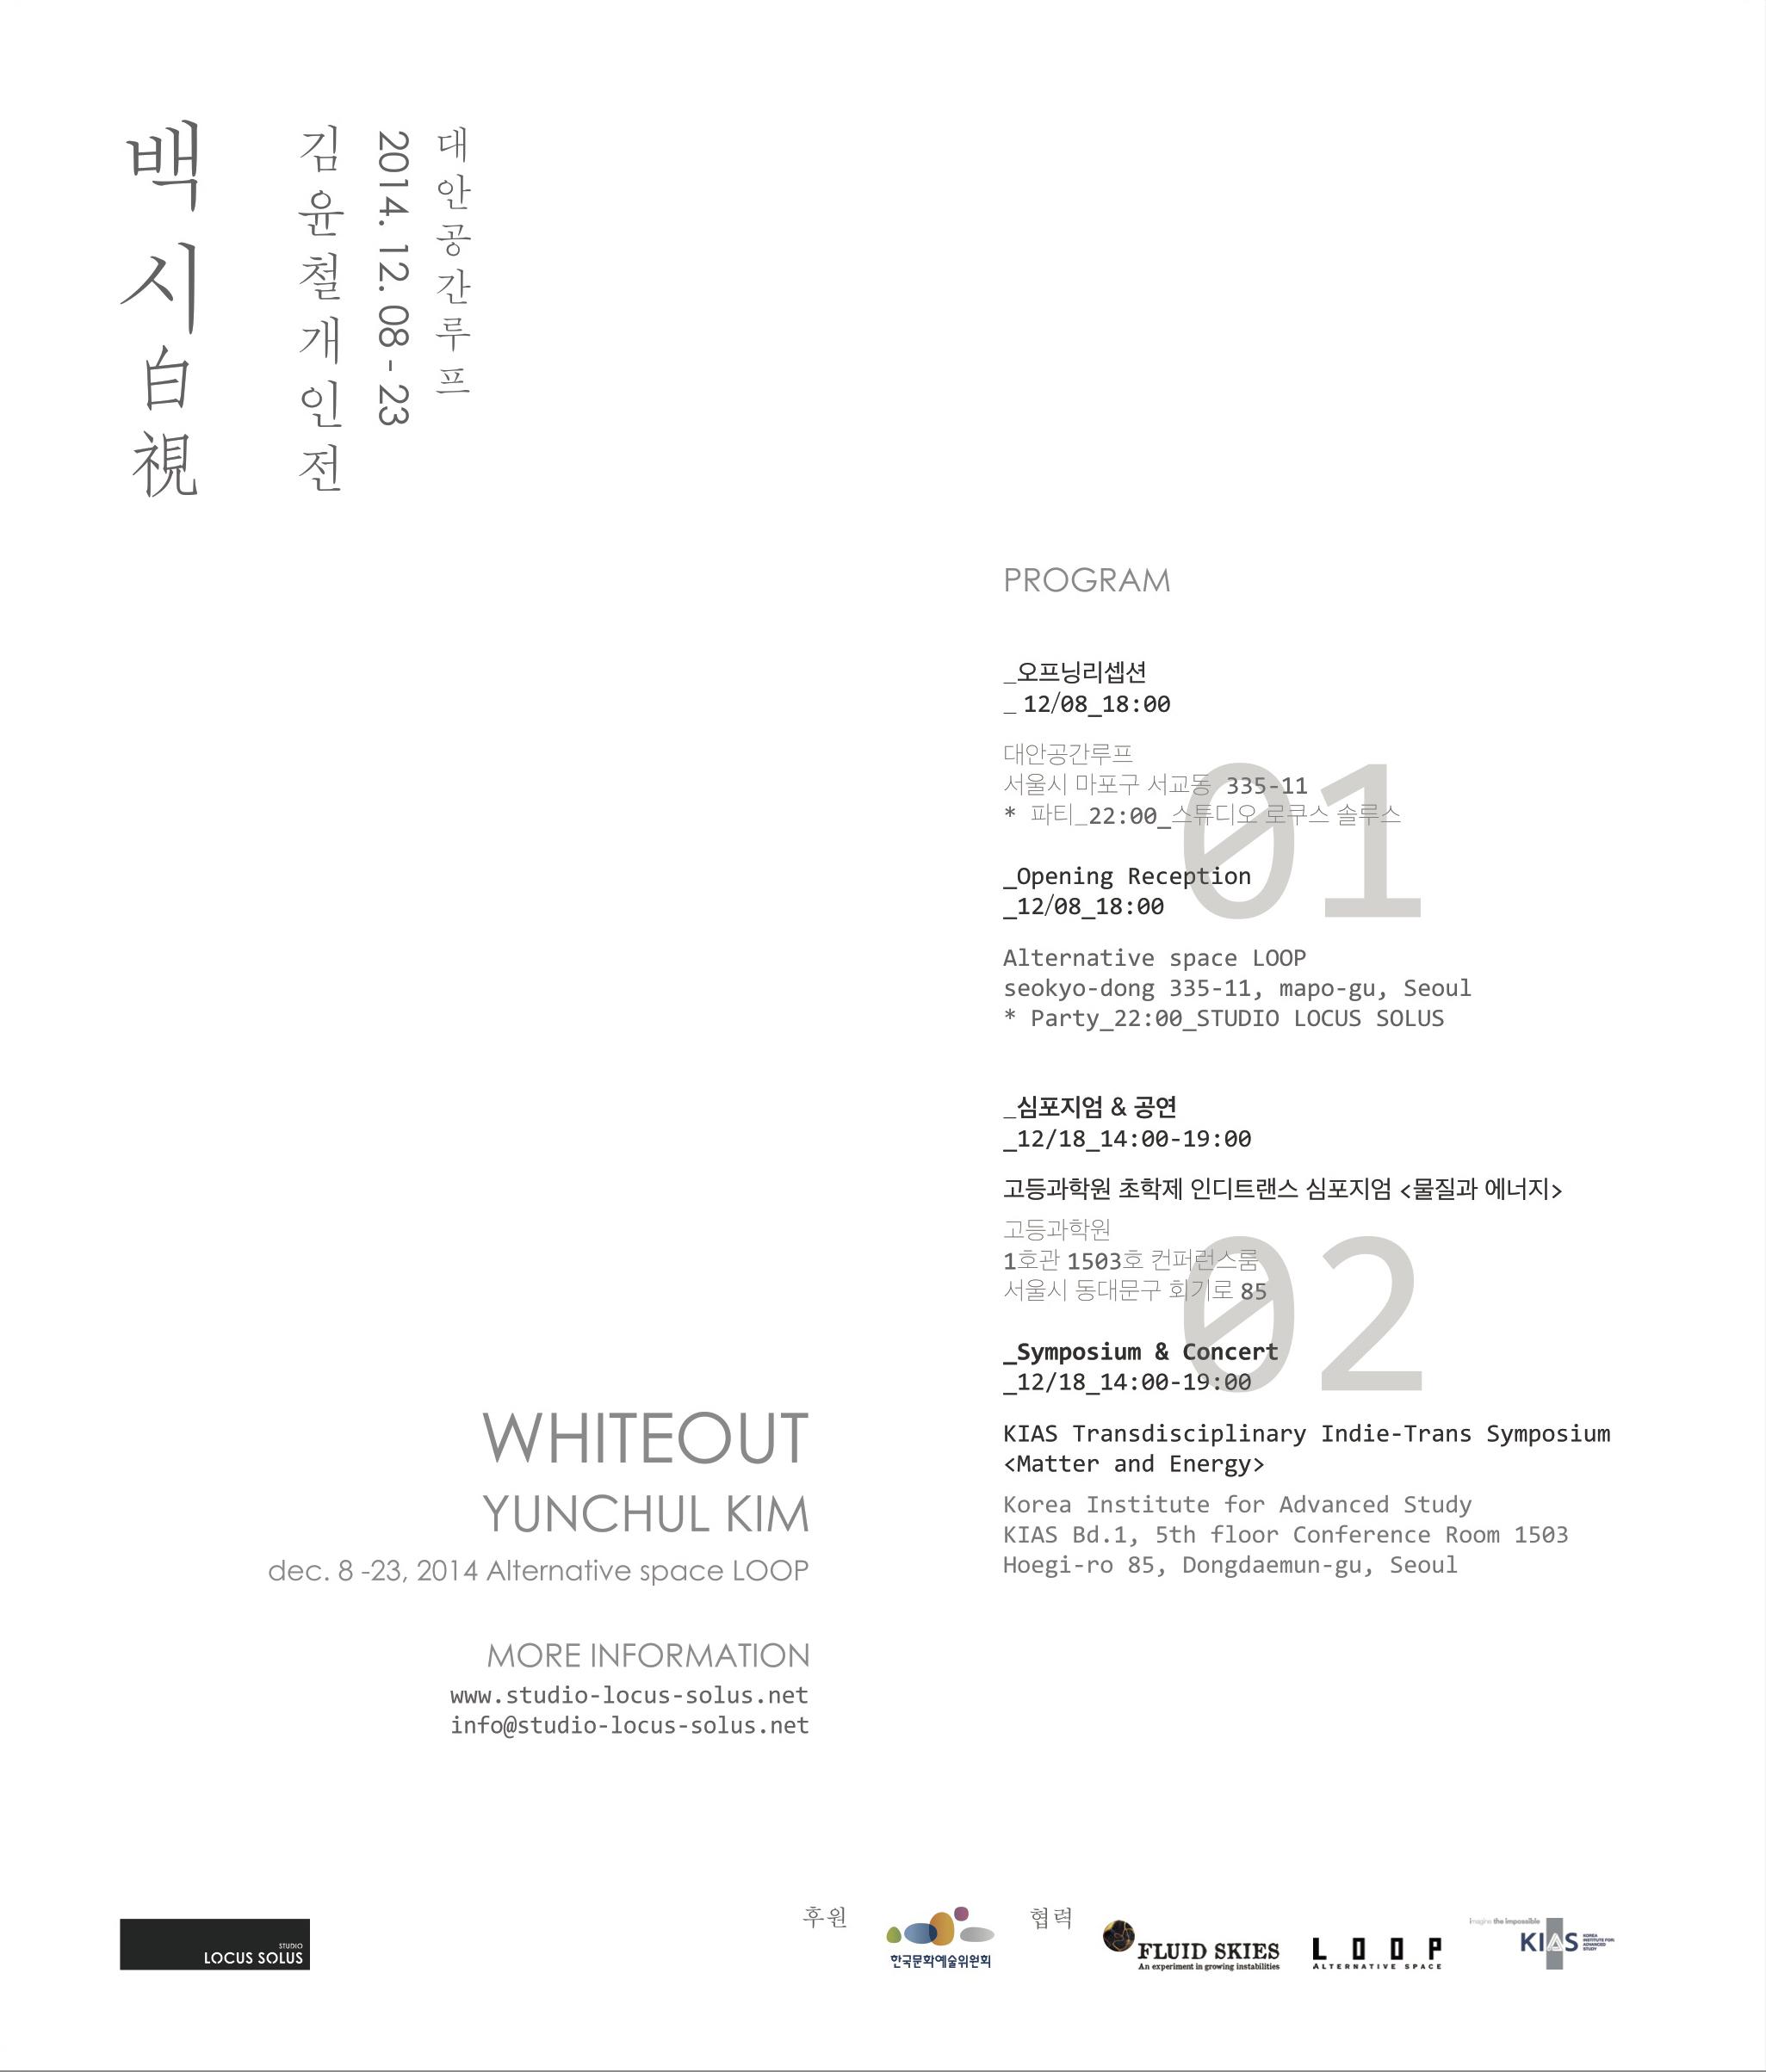 Yunchul Kim Solo Exhibition: WHITEOUT